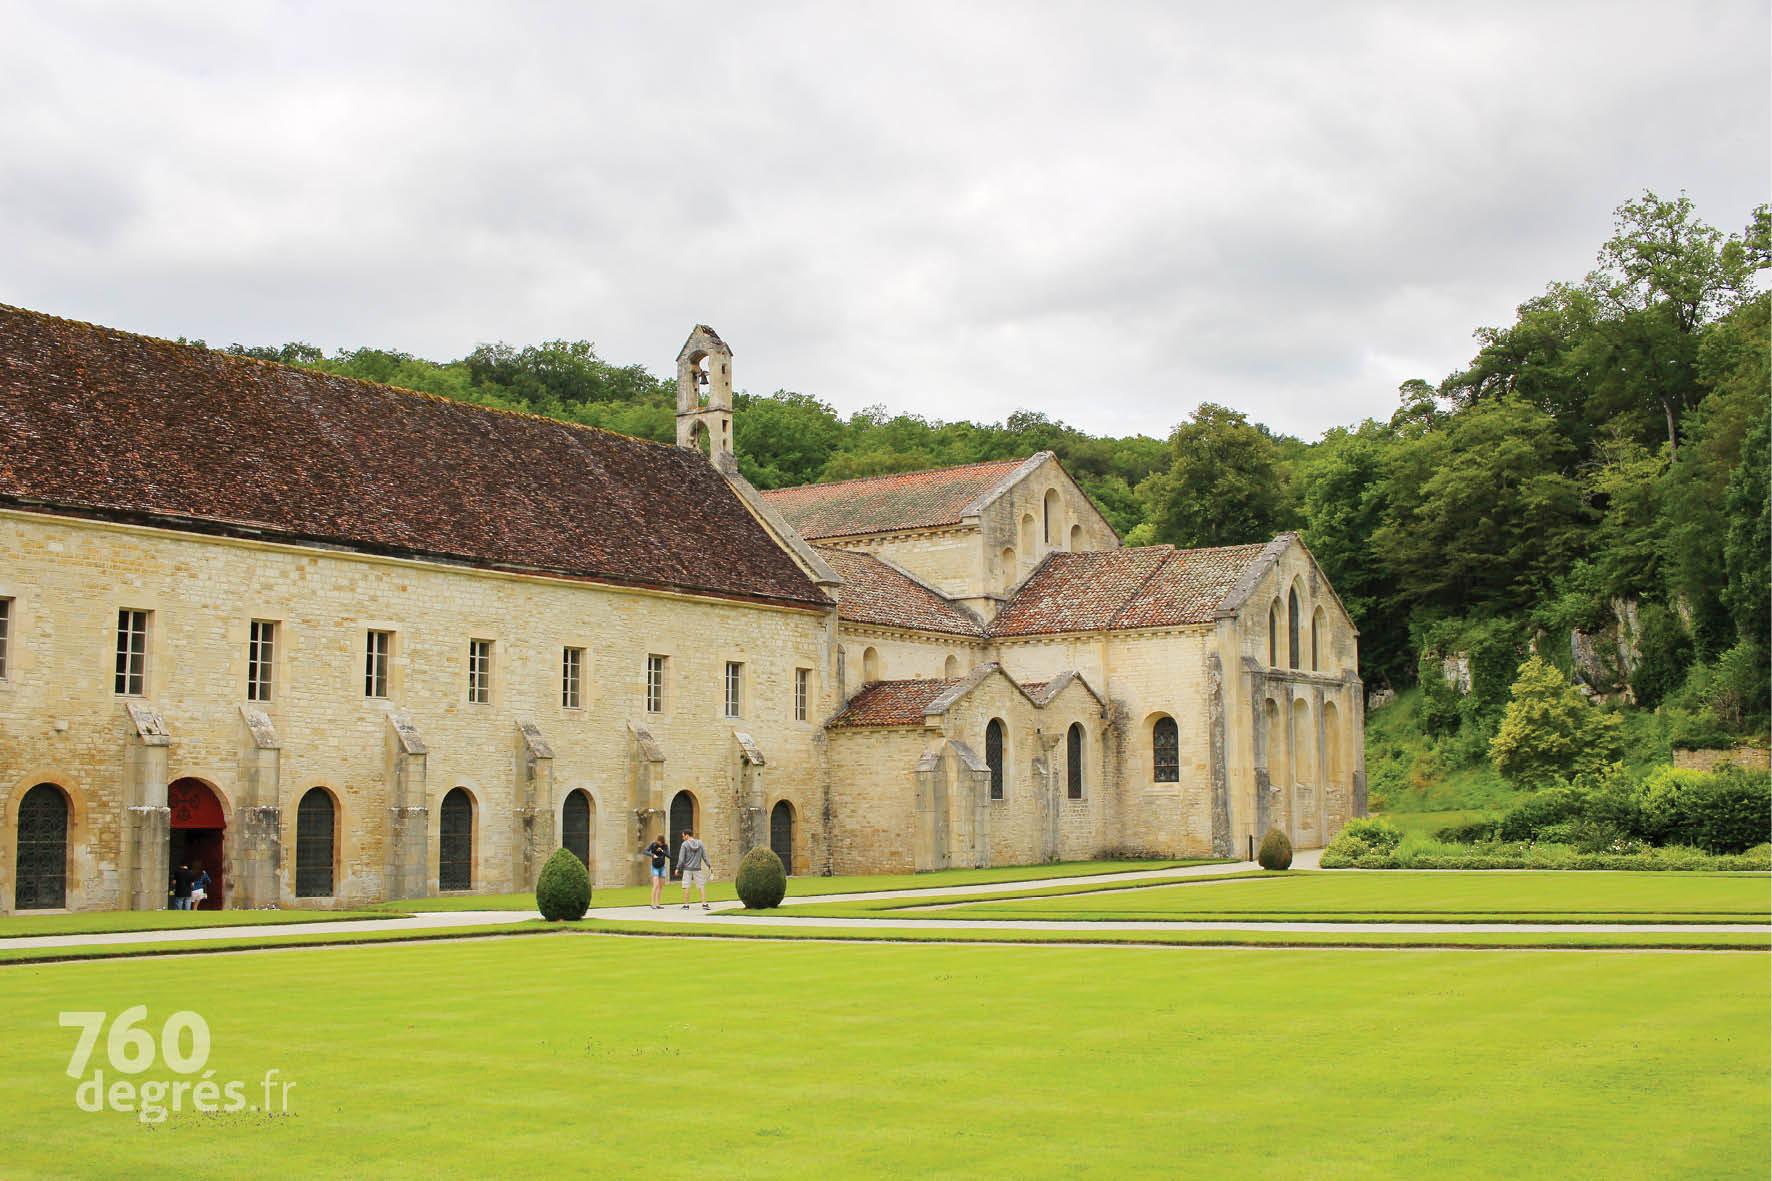 760degres-abbaye-fontenay-01